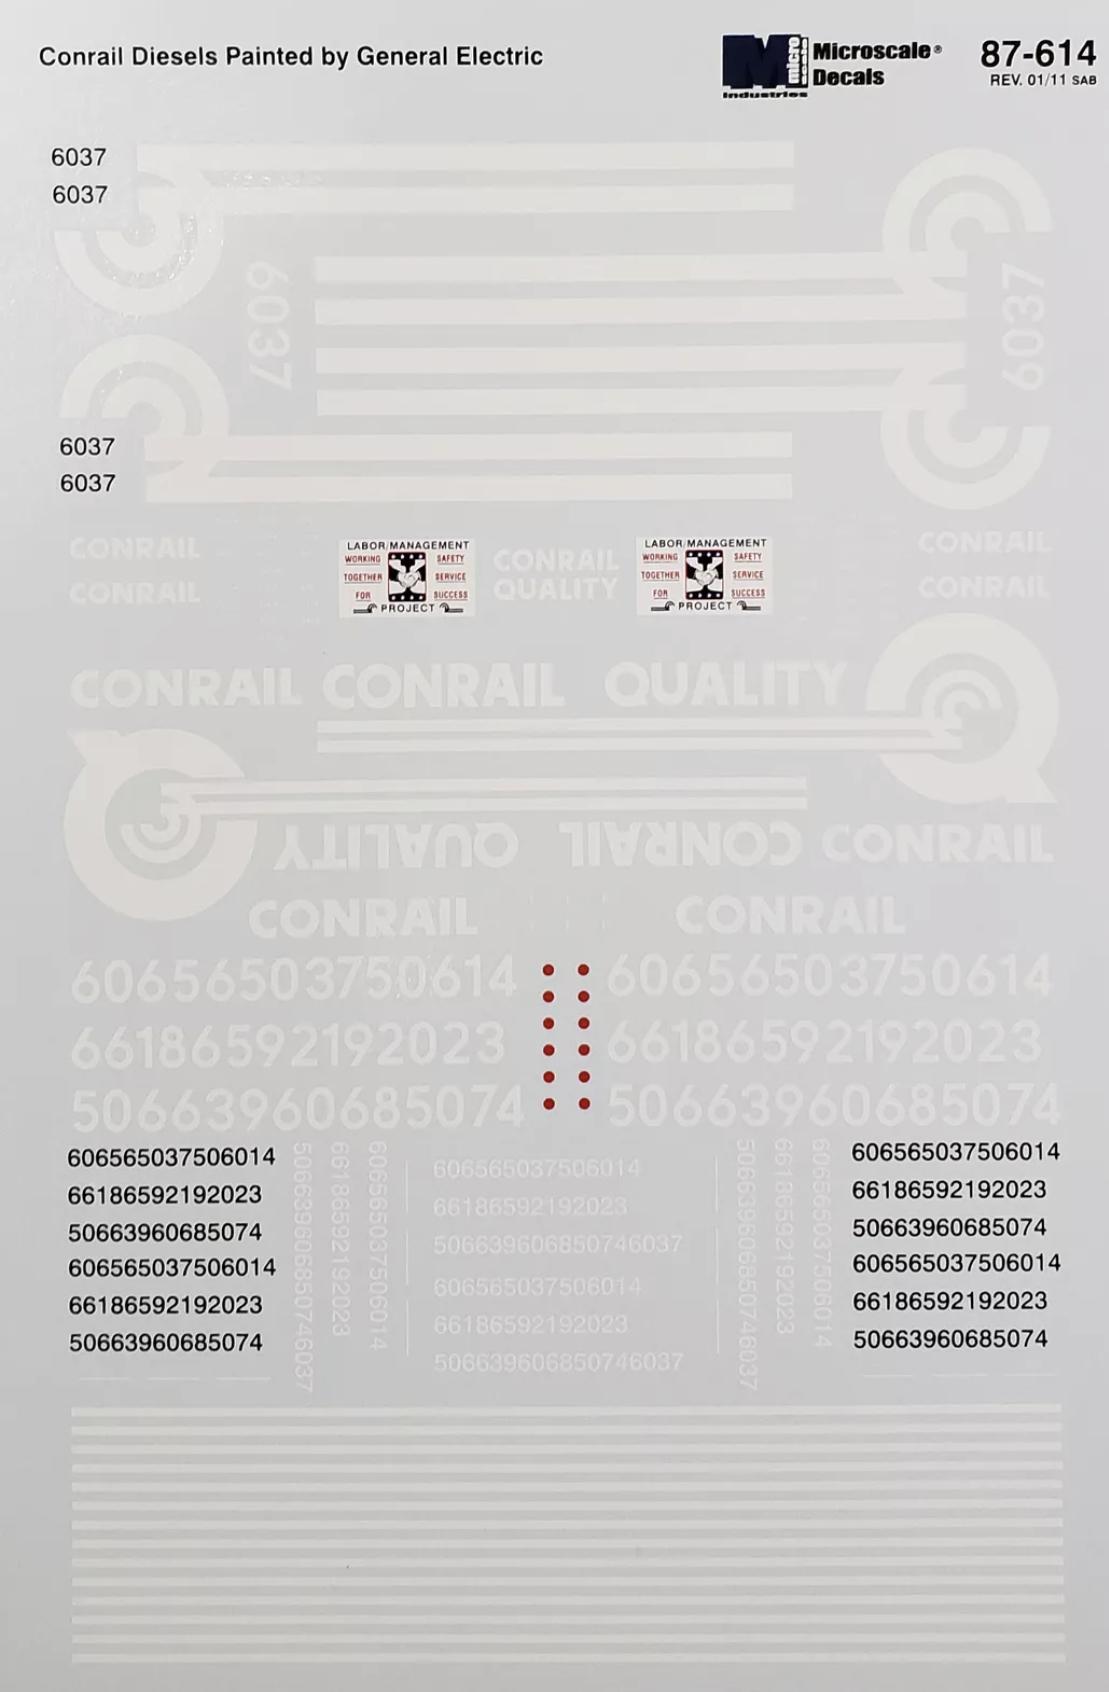 C5CB19B0-038C-4C67-B4FA-7048BCDE4691.jpeg